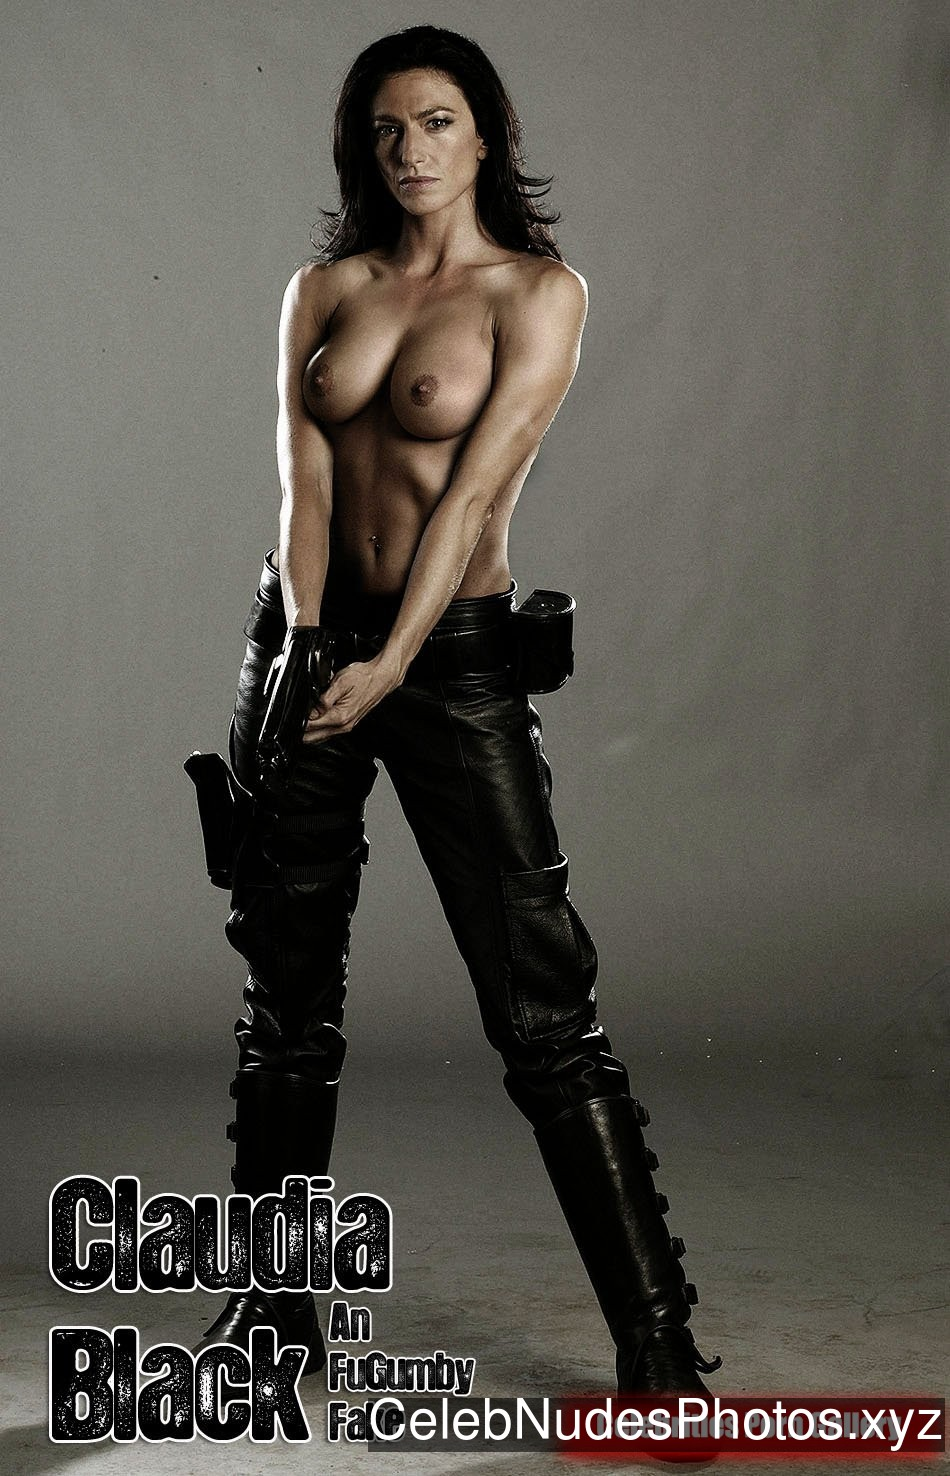 Claudia Black Celebs Naked sexy 2